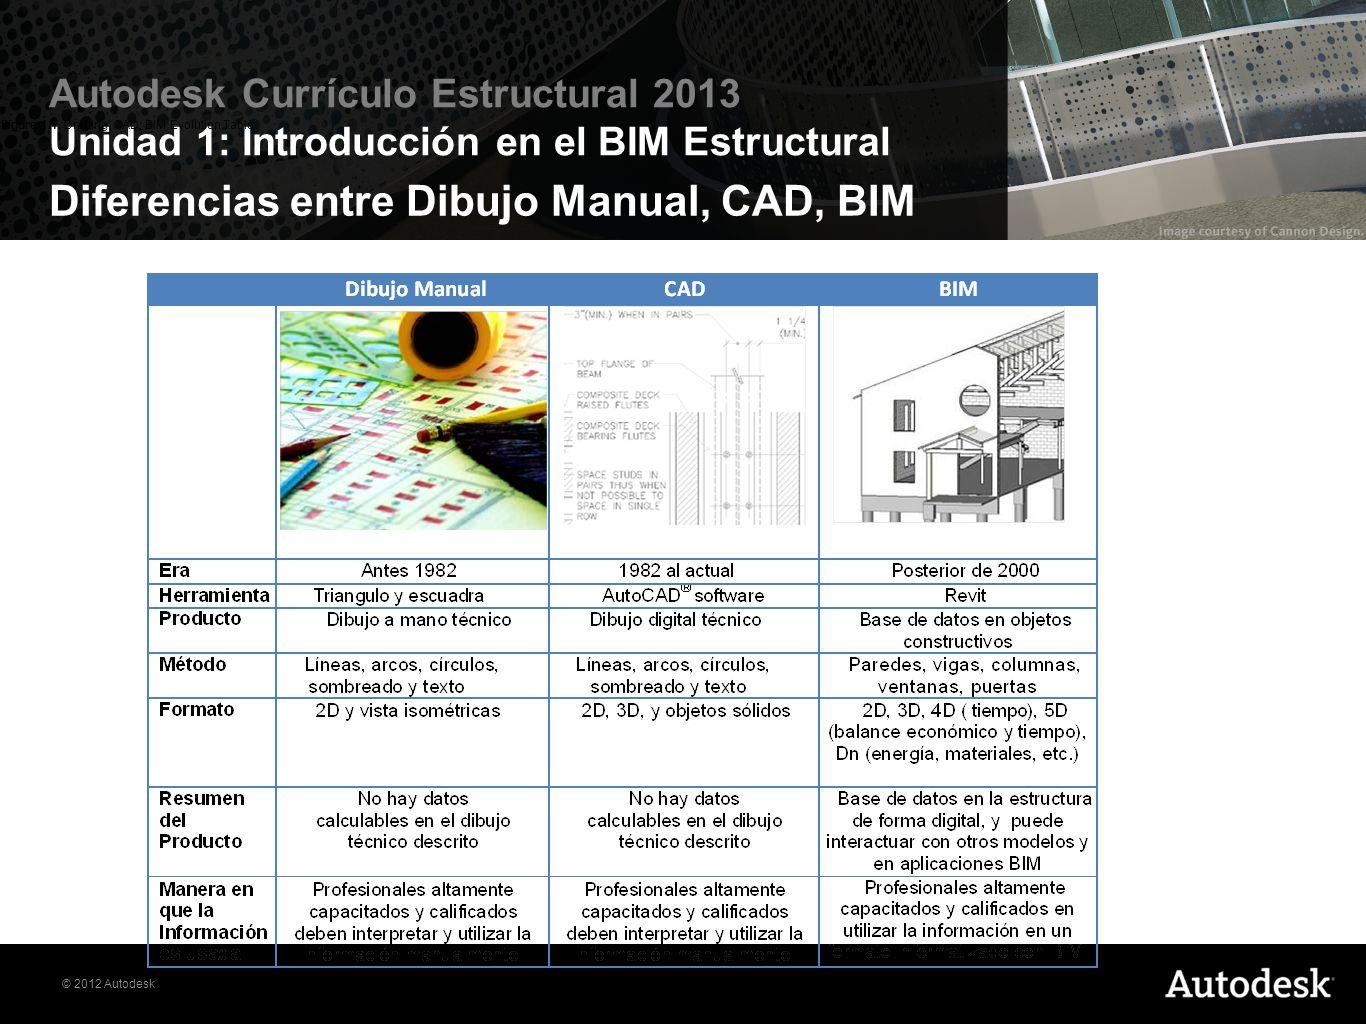 Diferencias entre Dibujo Manual, CAD, BIM